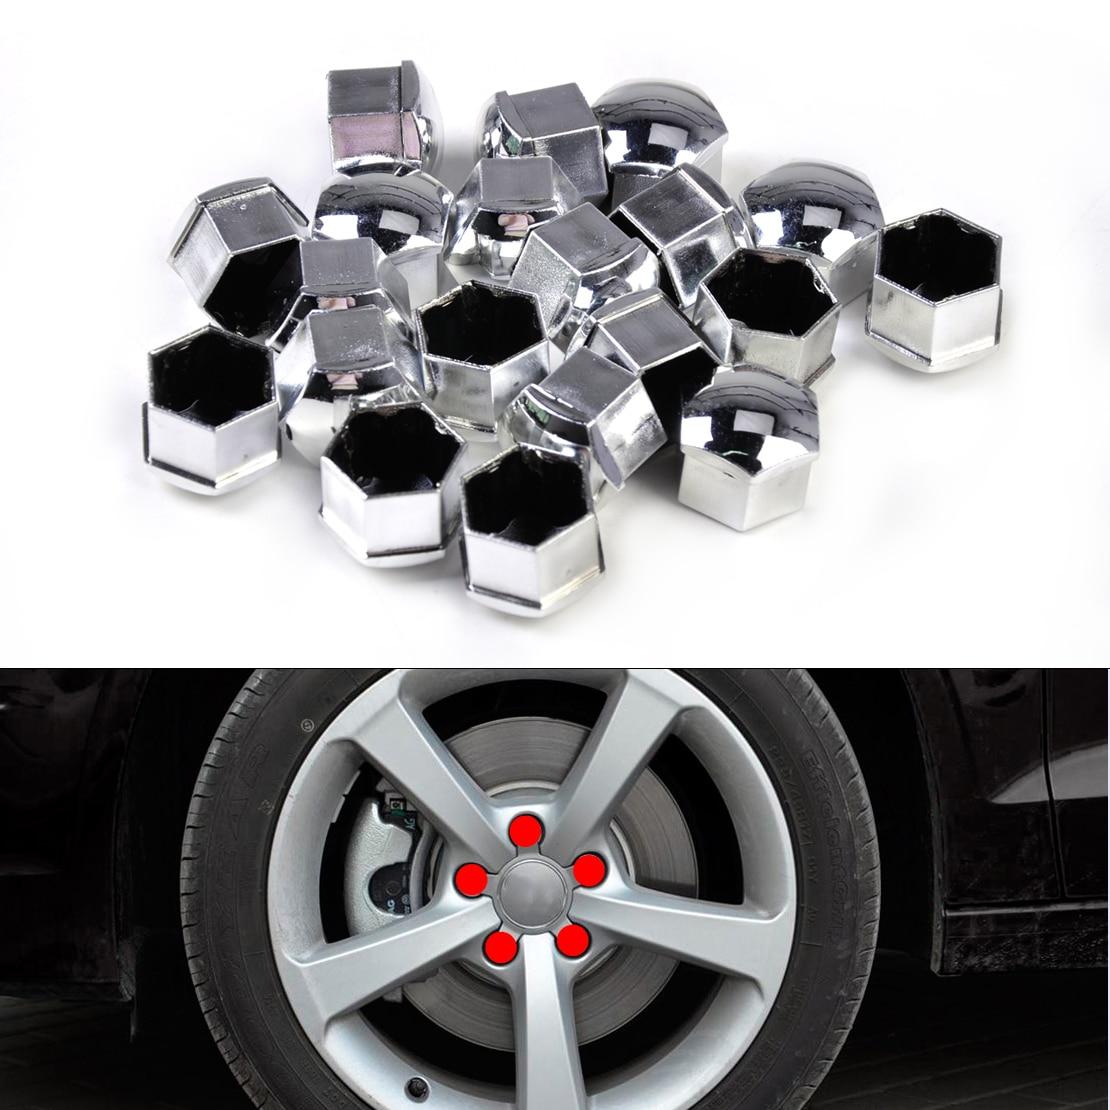 AUDI VW SEAT SKODA Alloy Wheel Bolt Nut Caps Covers NEW!!! Tool GENUINE!!